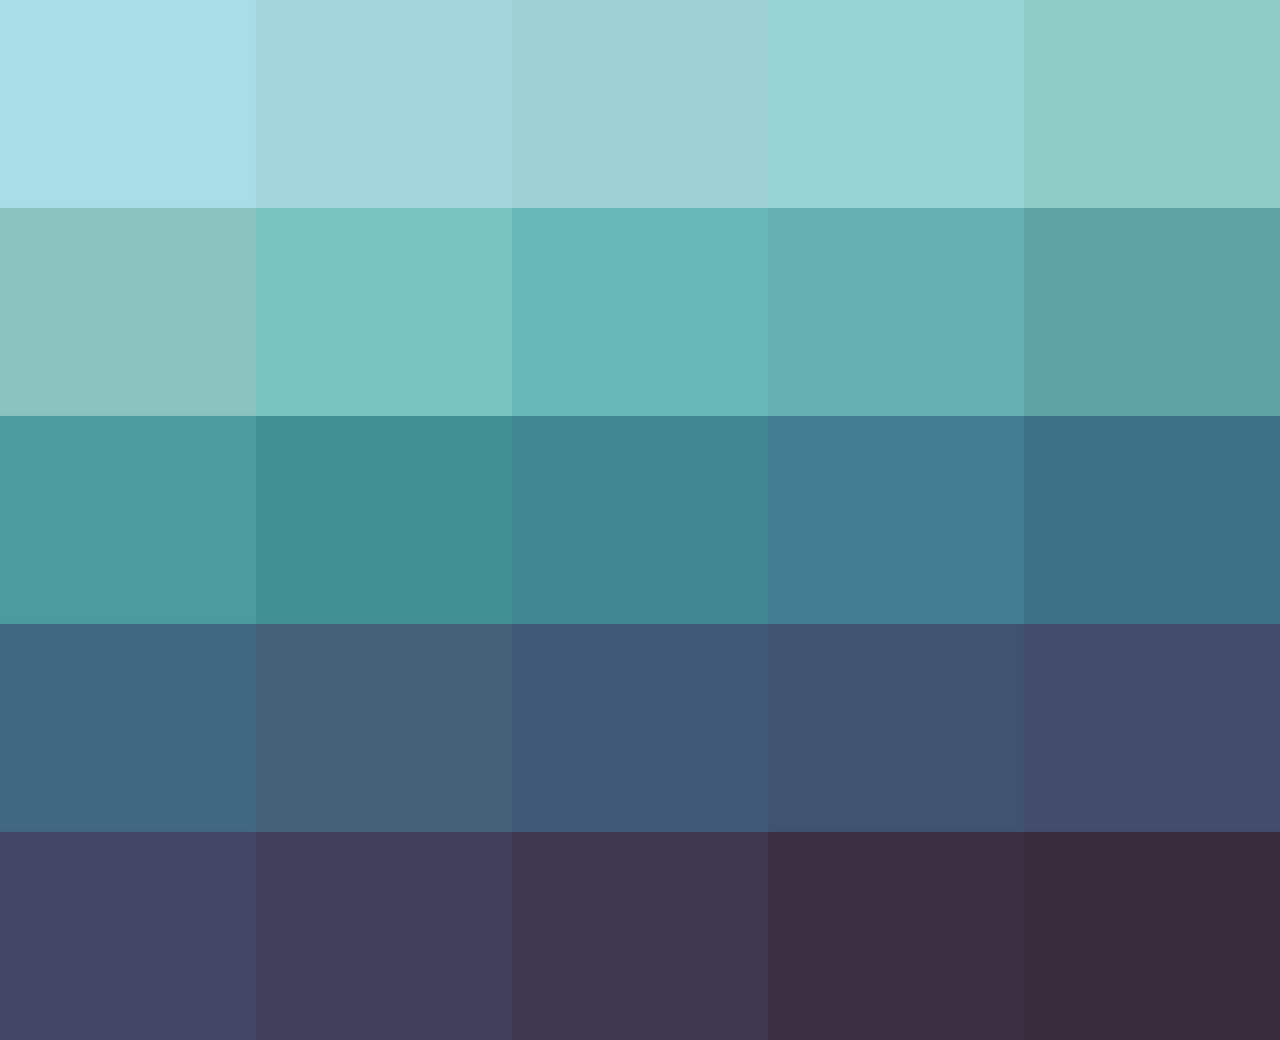 Sea Green Blue Paint